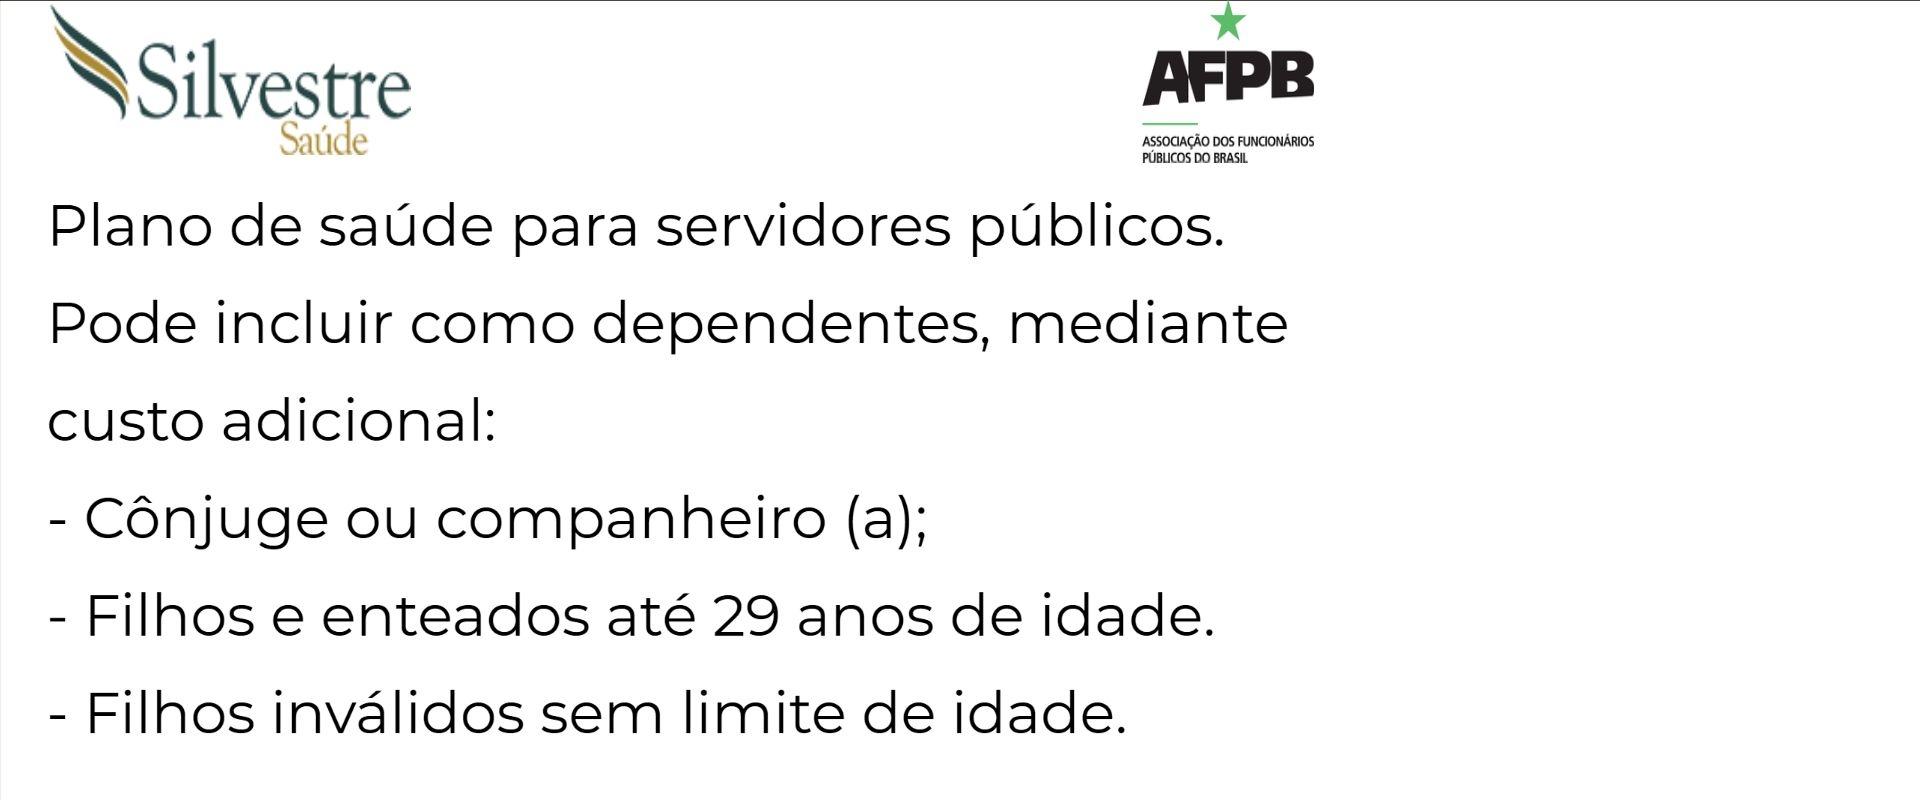 Silvestre AFPB